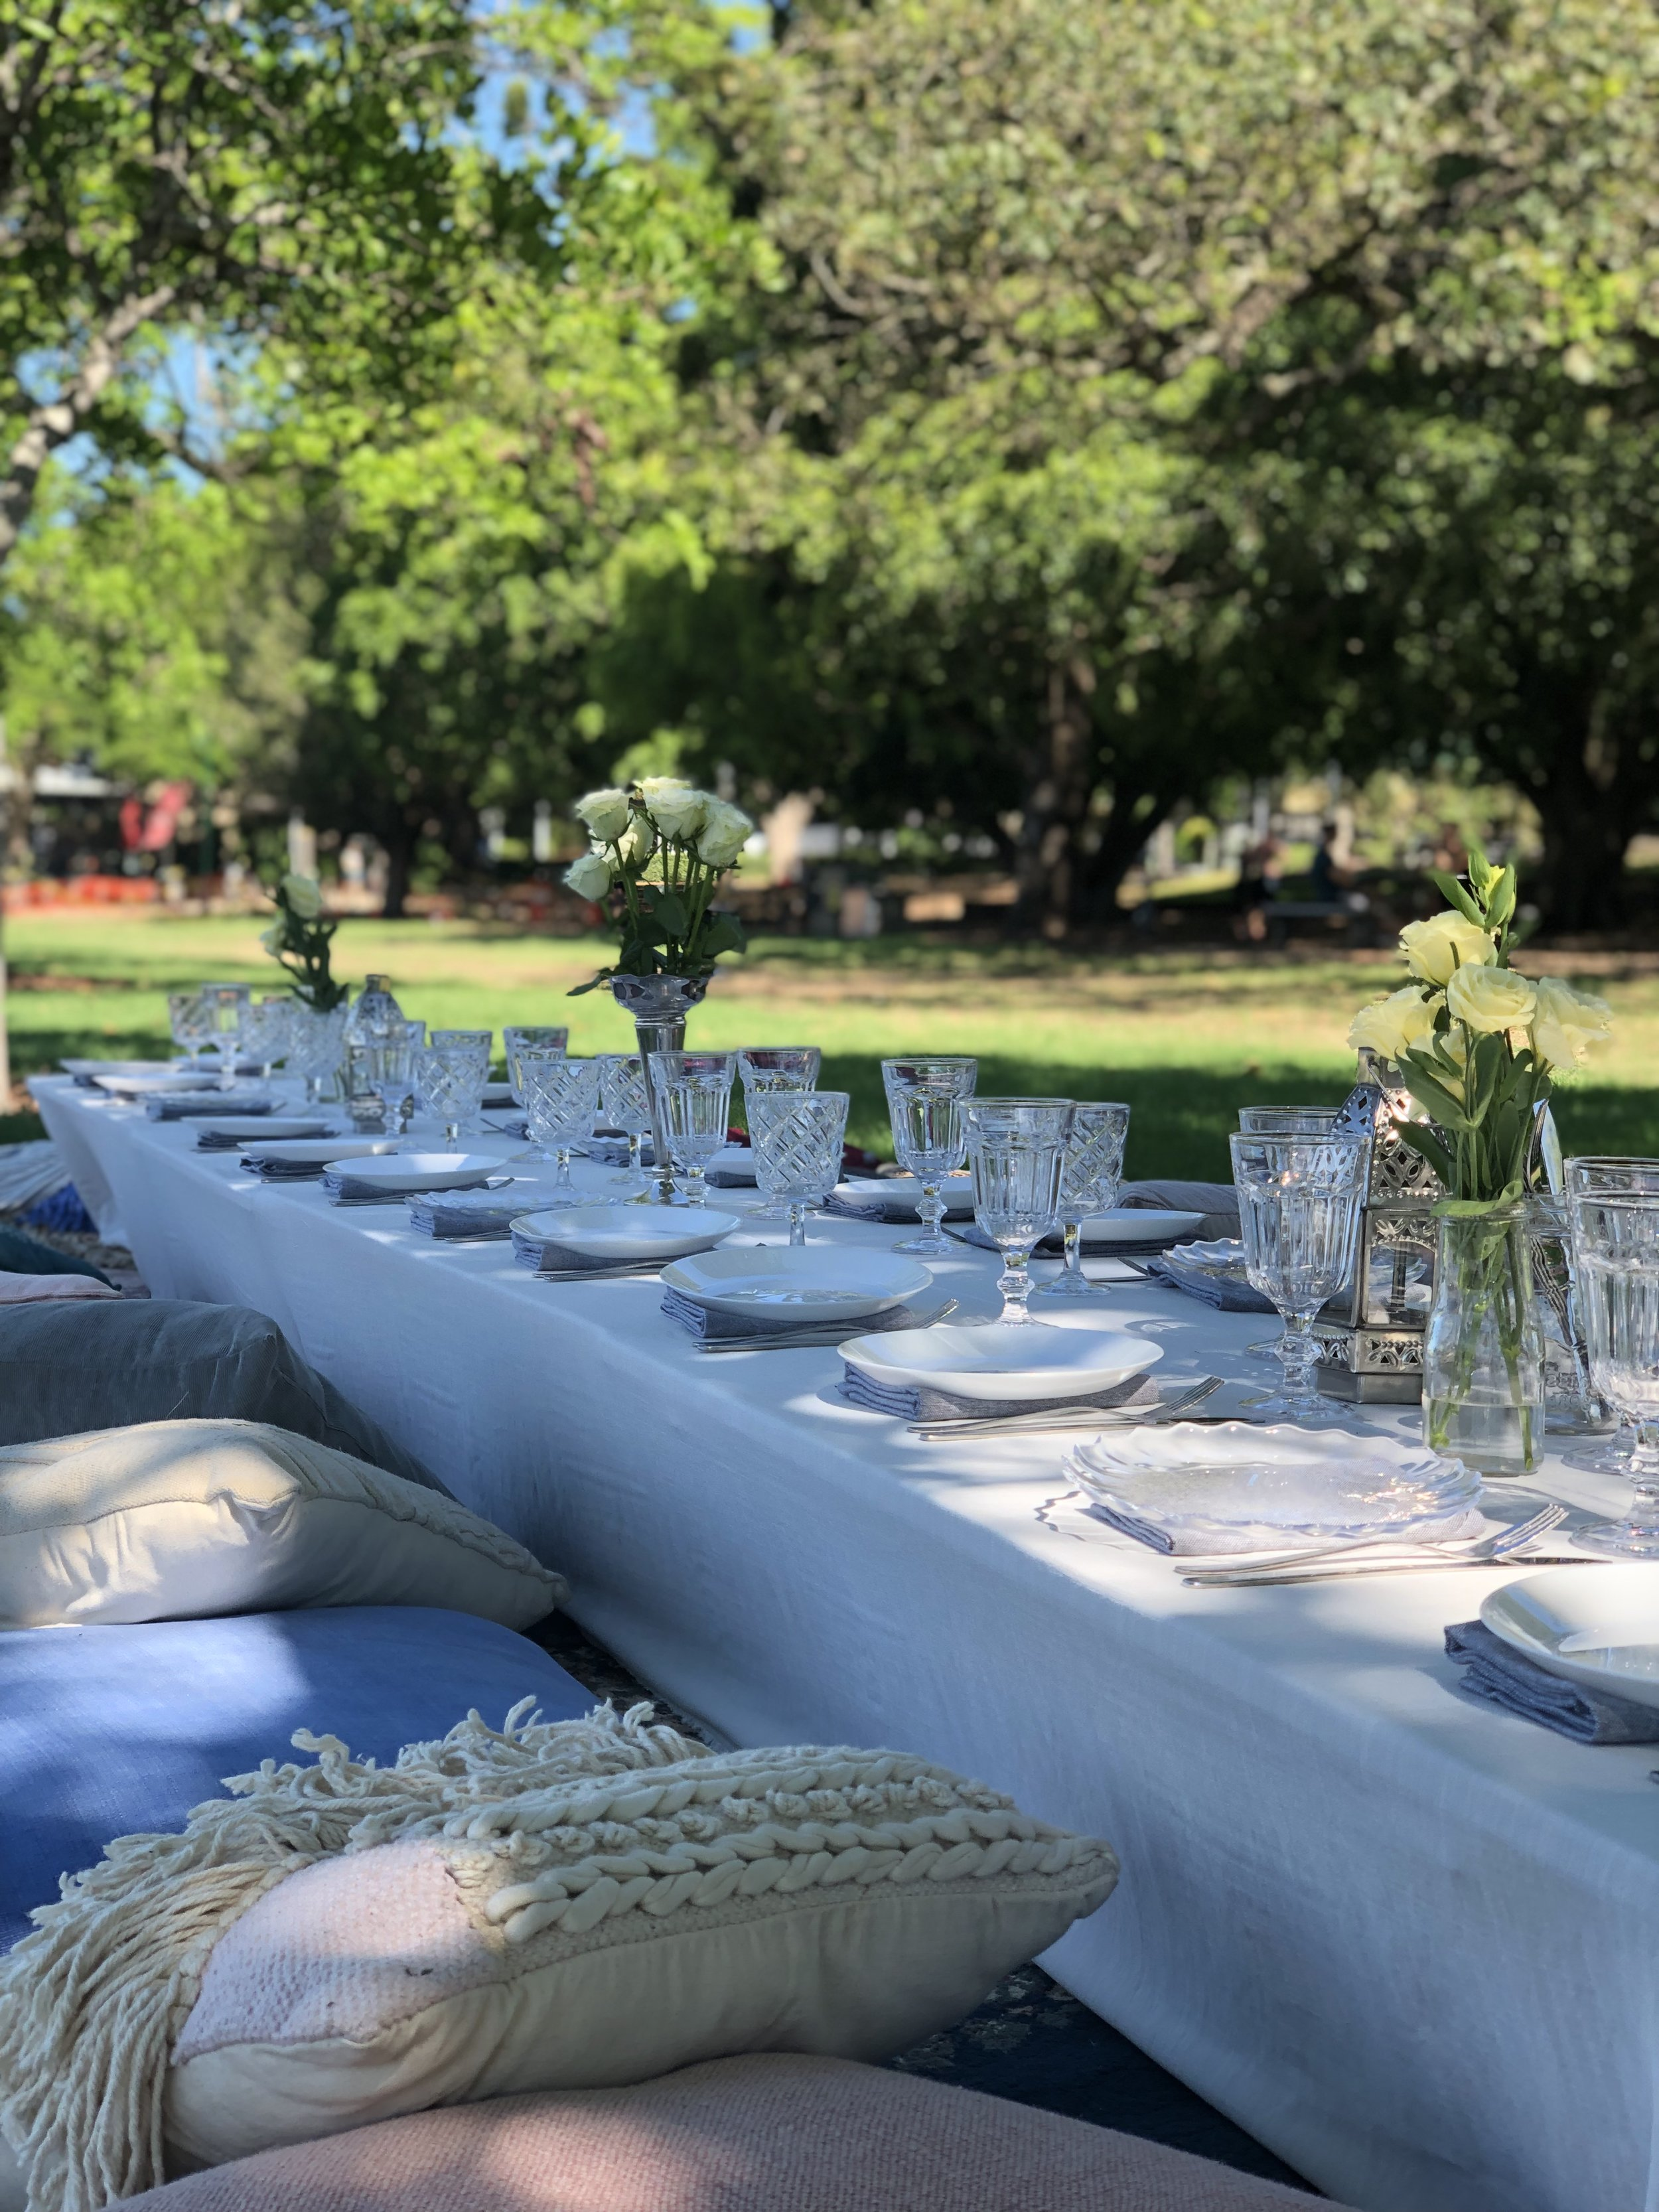 Picnic events - Parties - Birthdays - Proposals